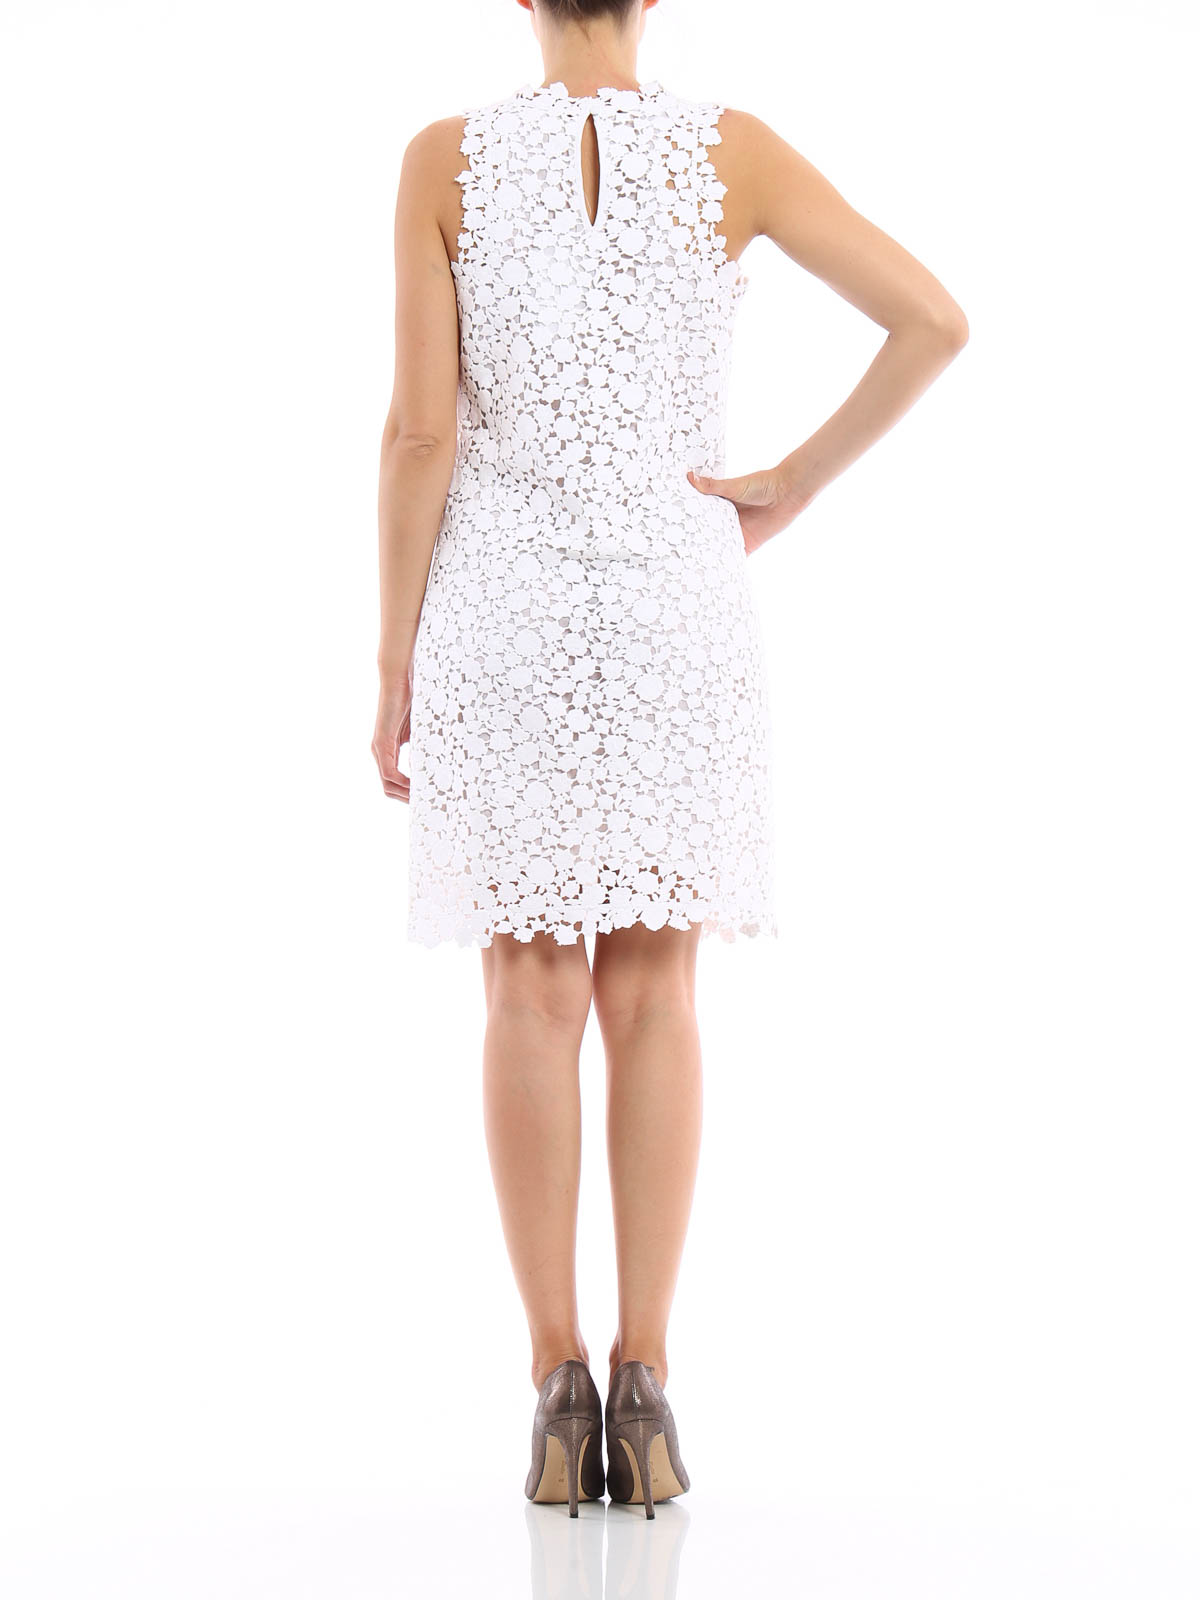 50e8e50ae9d Michael Kors - Floral lace dress - short dresses - MS68W5649P 100